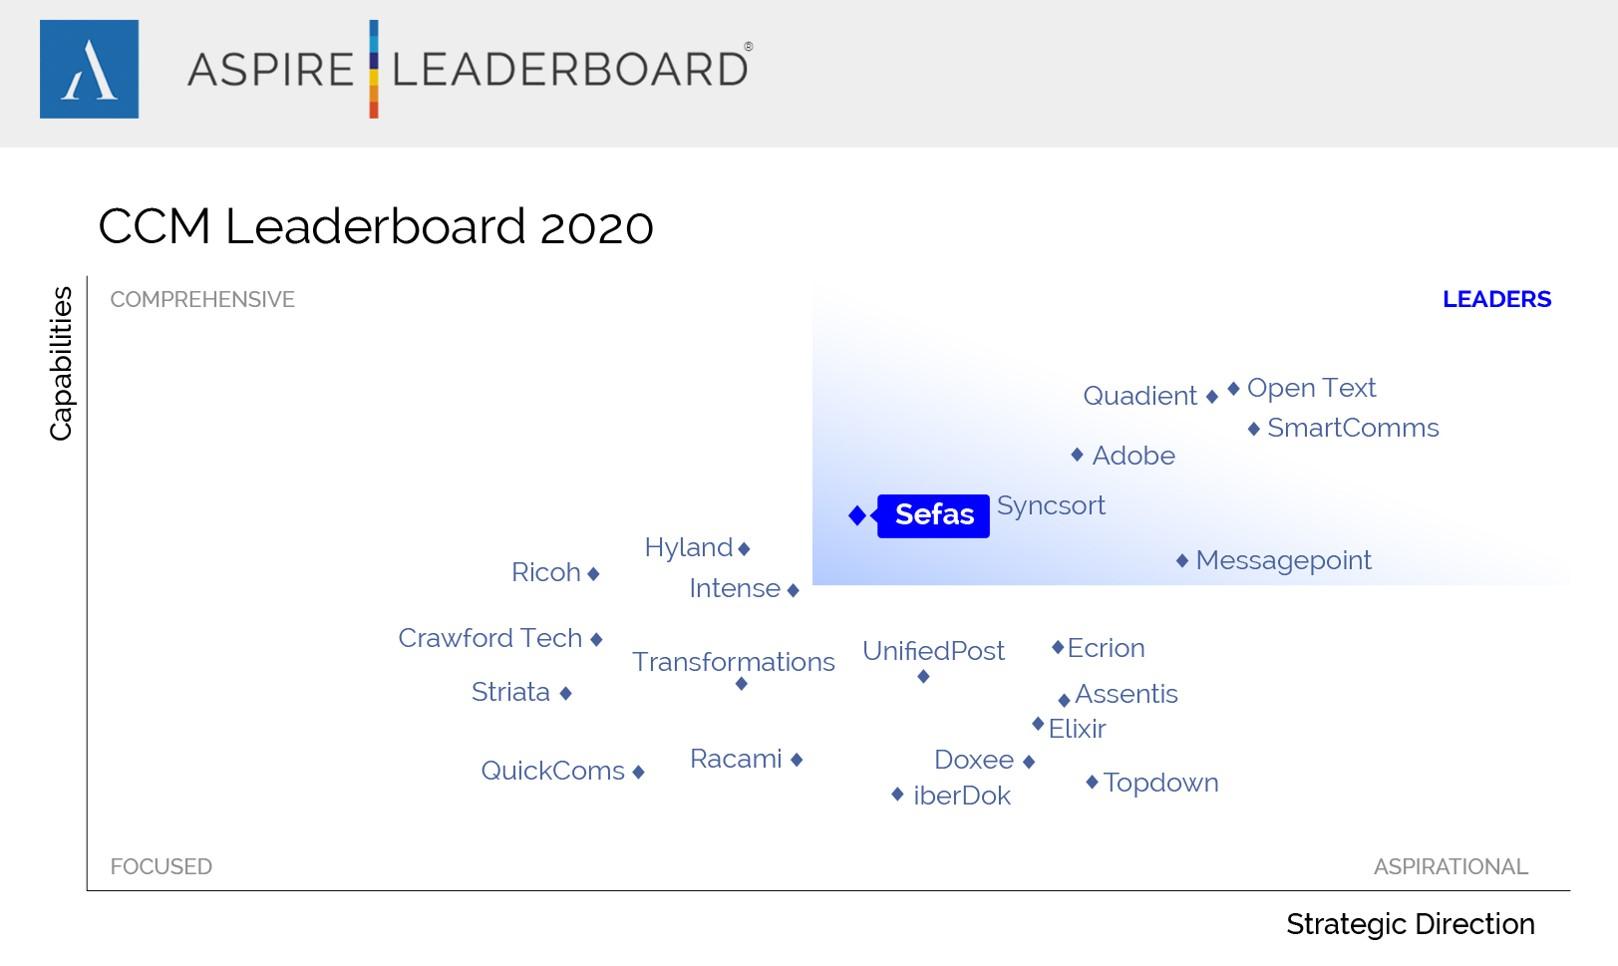 Leaderboard CCM 2020